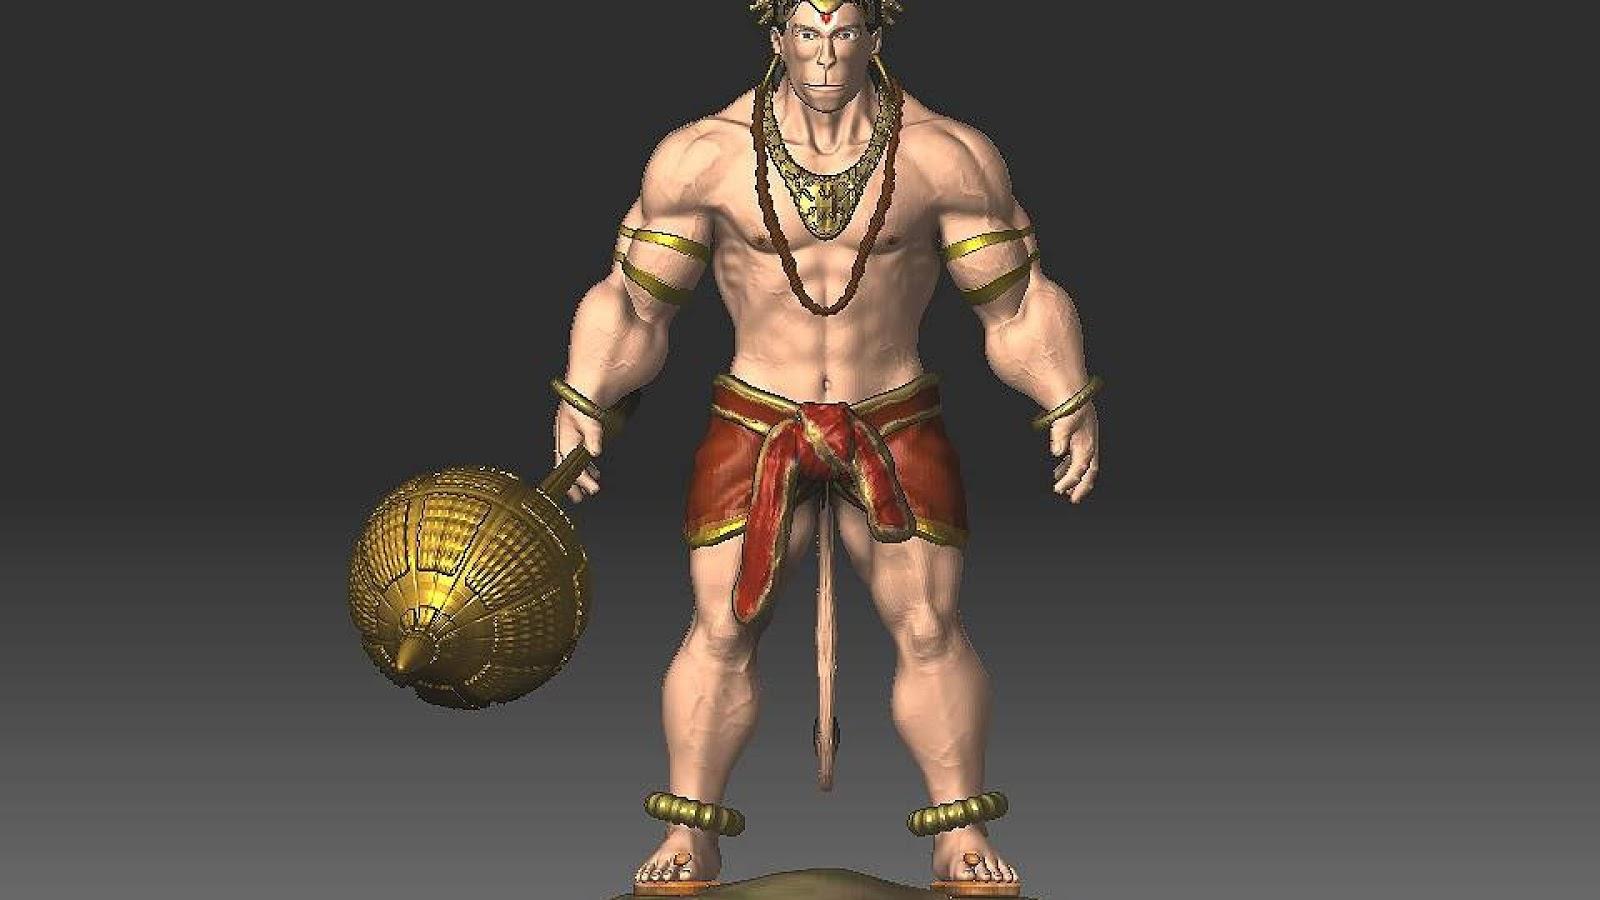 Desktop Wallpaper Hd 3d Full Screen God Ganesh God Hanuman Wallpapers Webntime